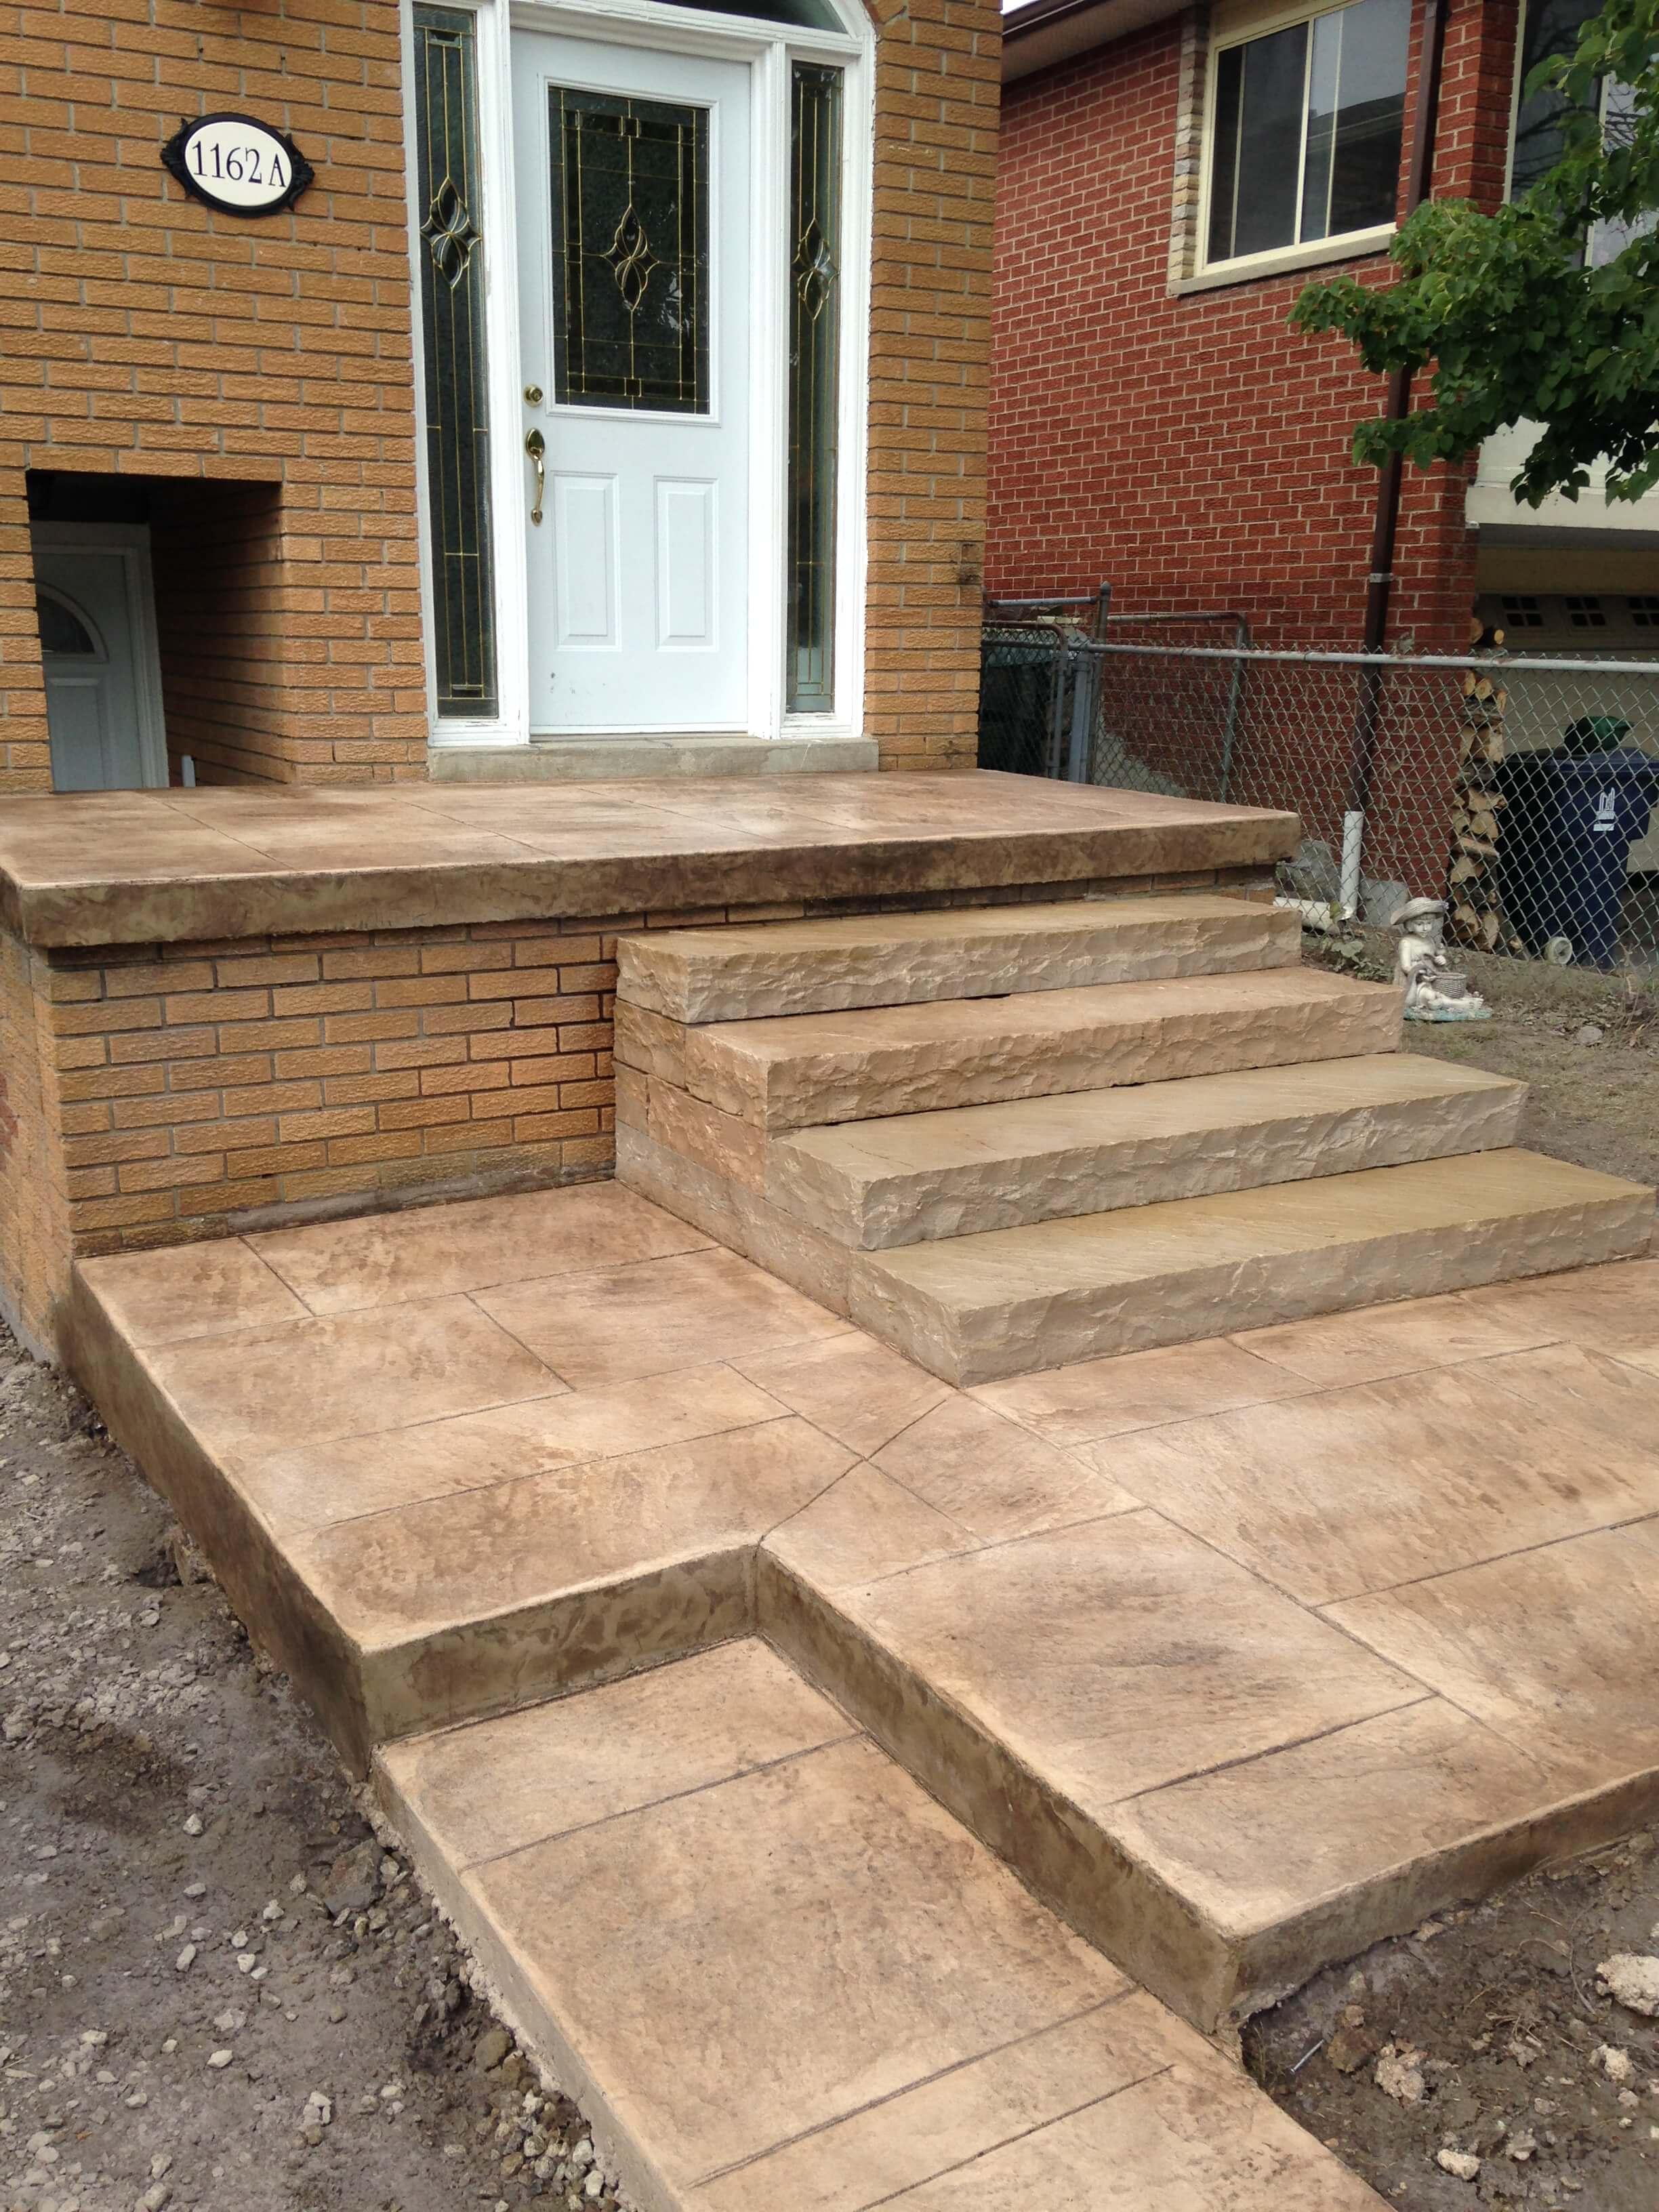 Decorative-Concrete-Contractor-Toronto-Kipling-Ave-5